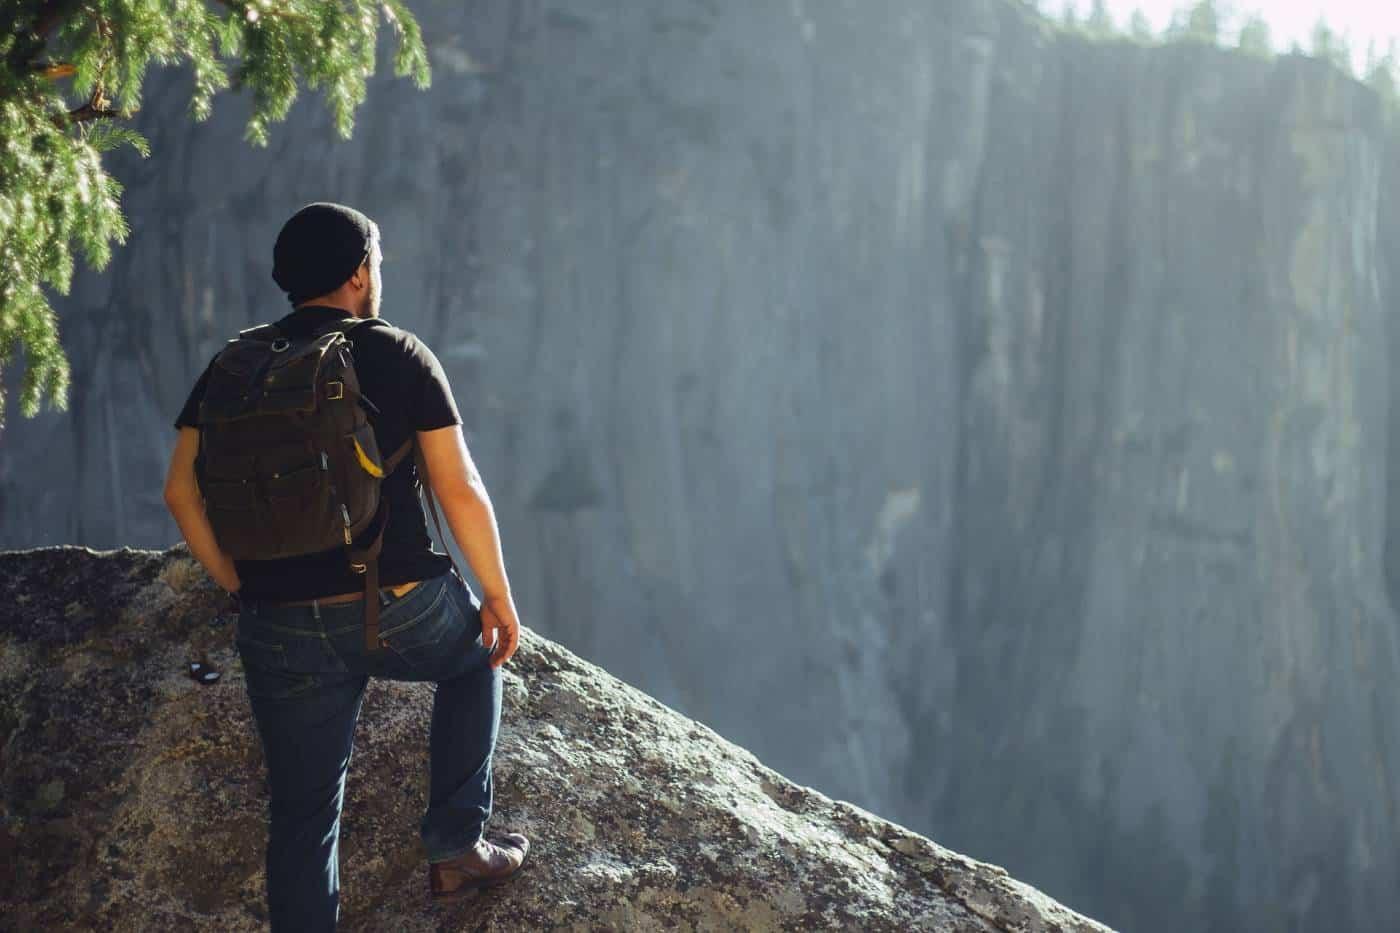 man wearing dark colored backpack